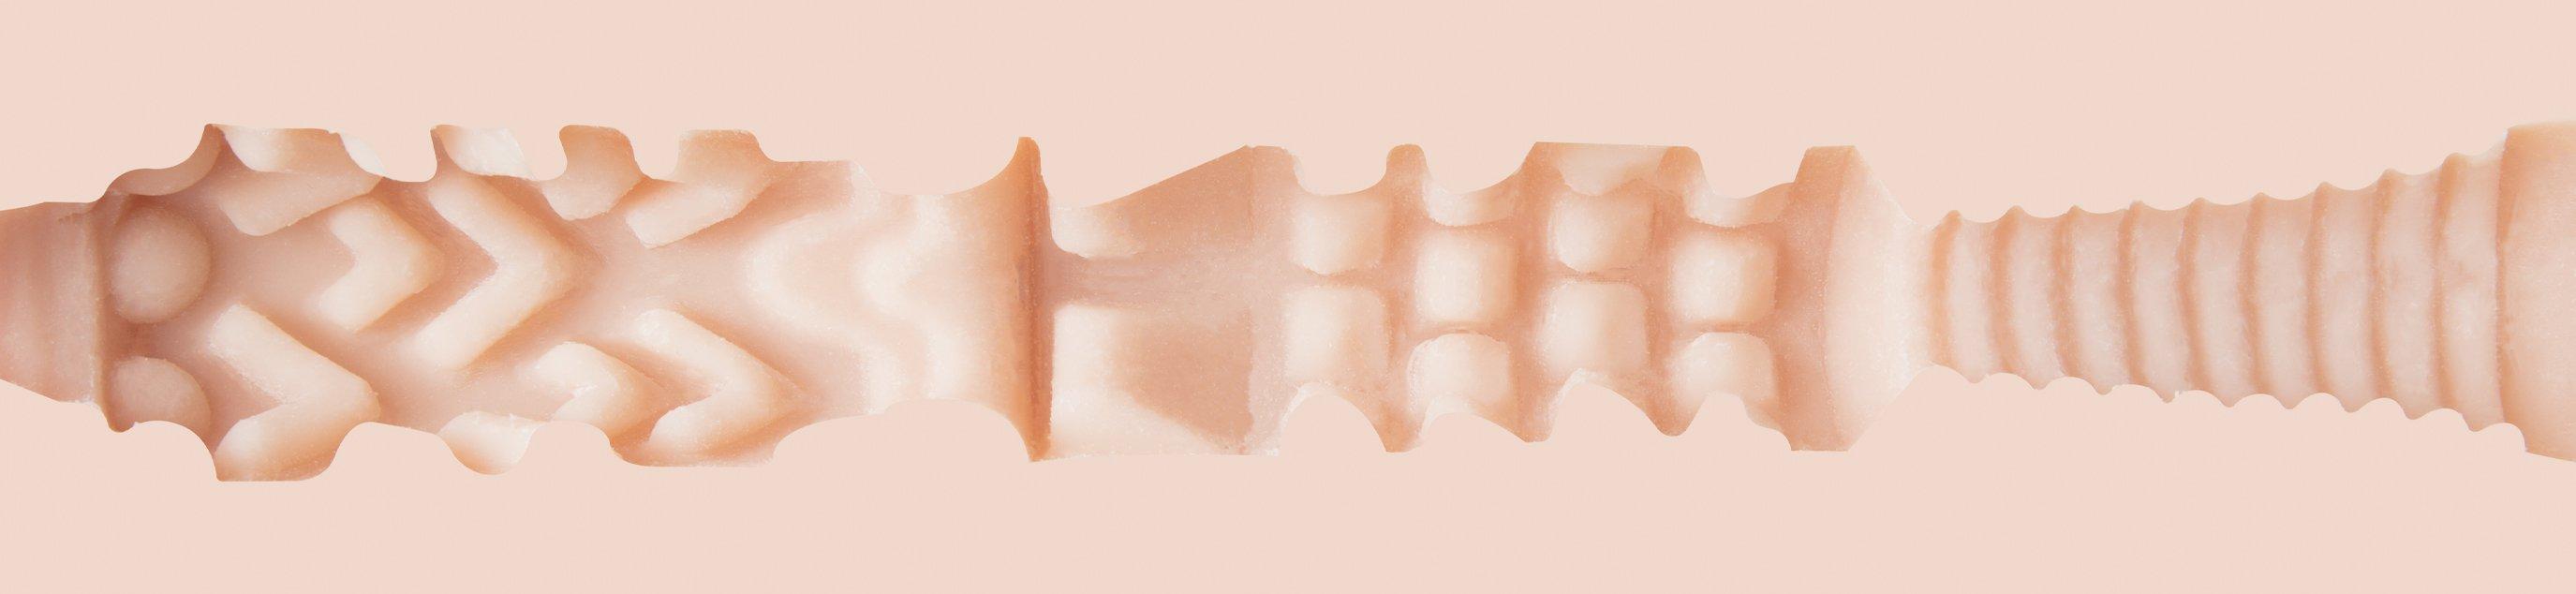 Lit Fleshlight Girls Texture Image